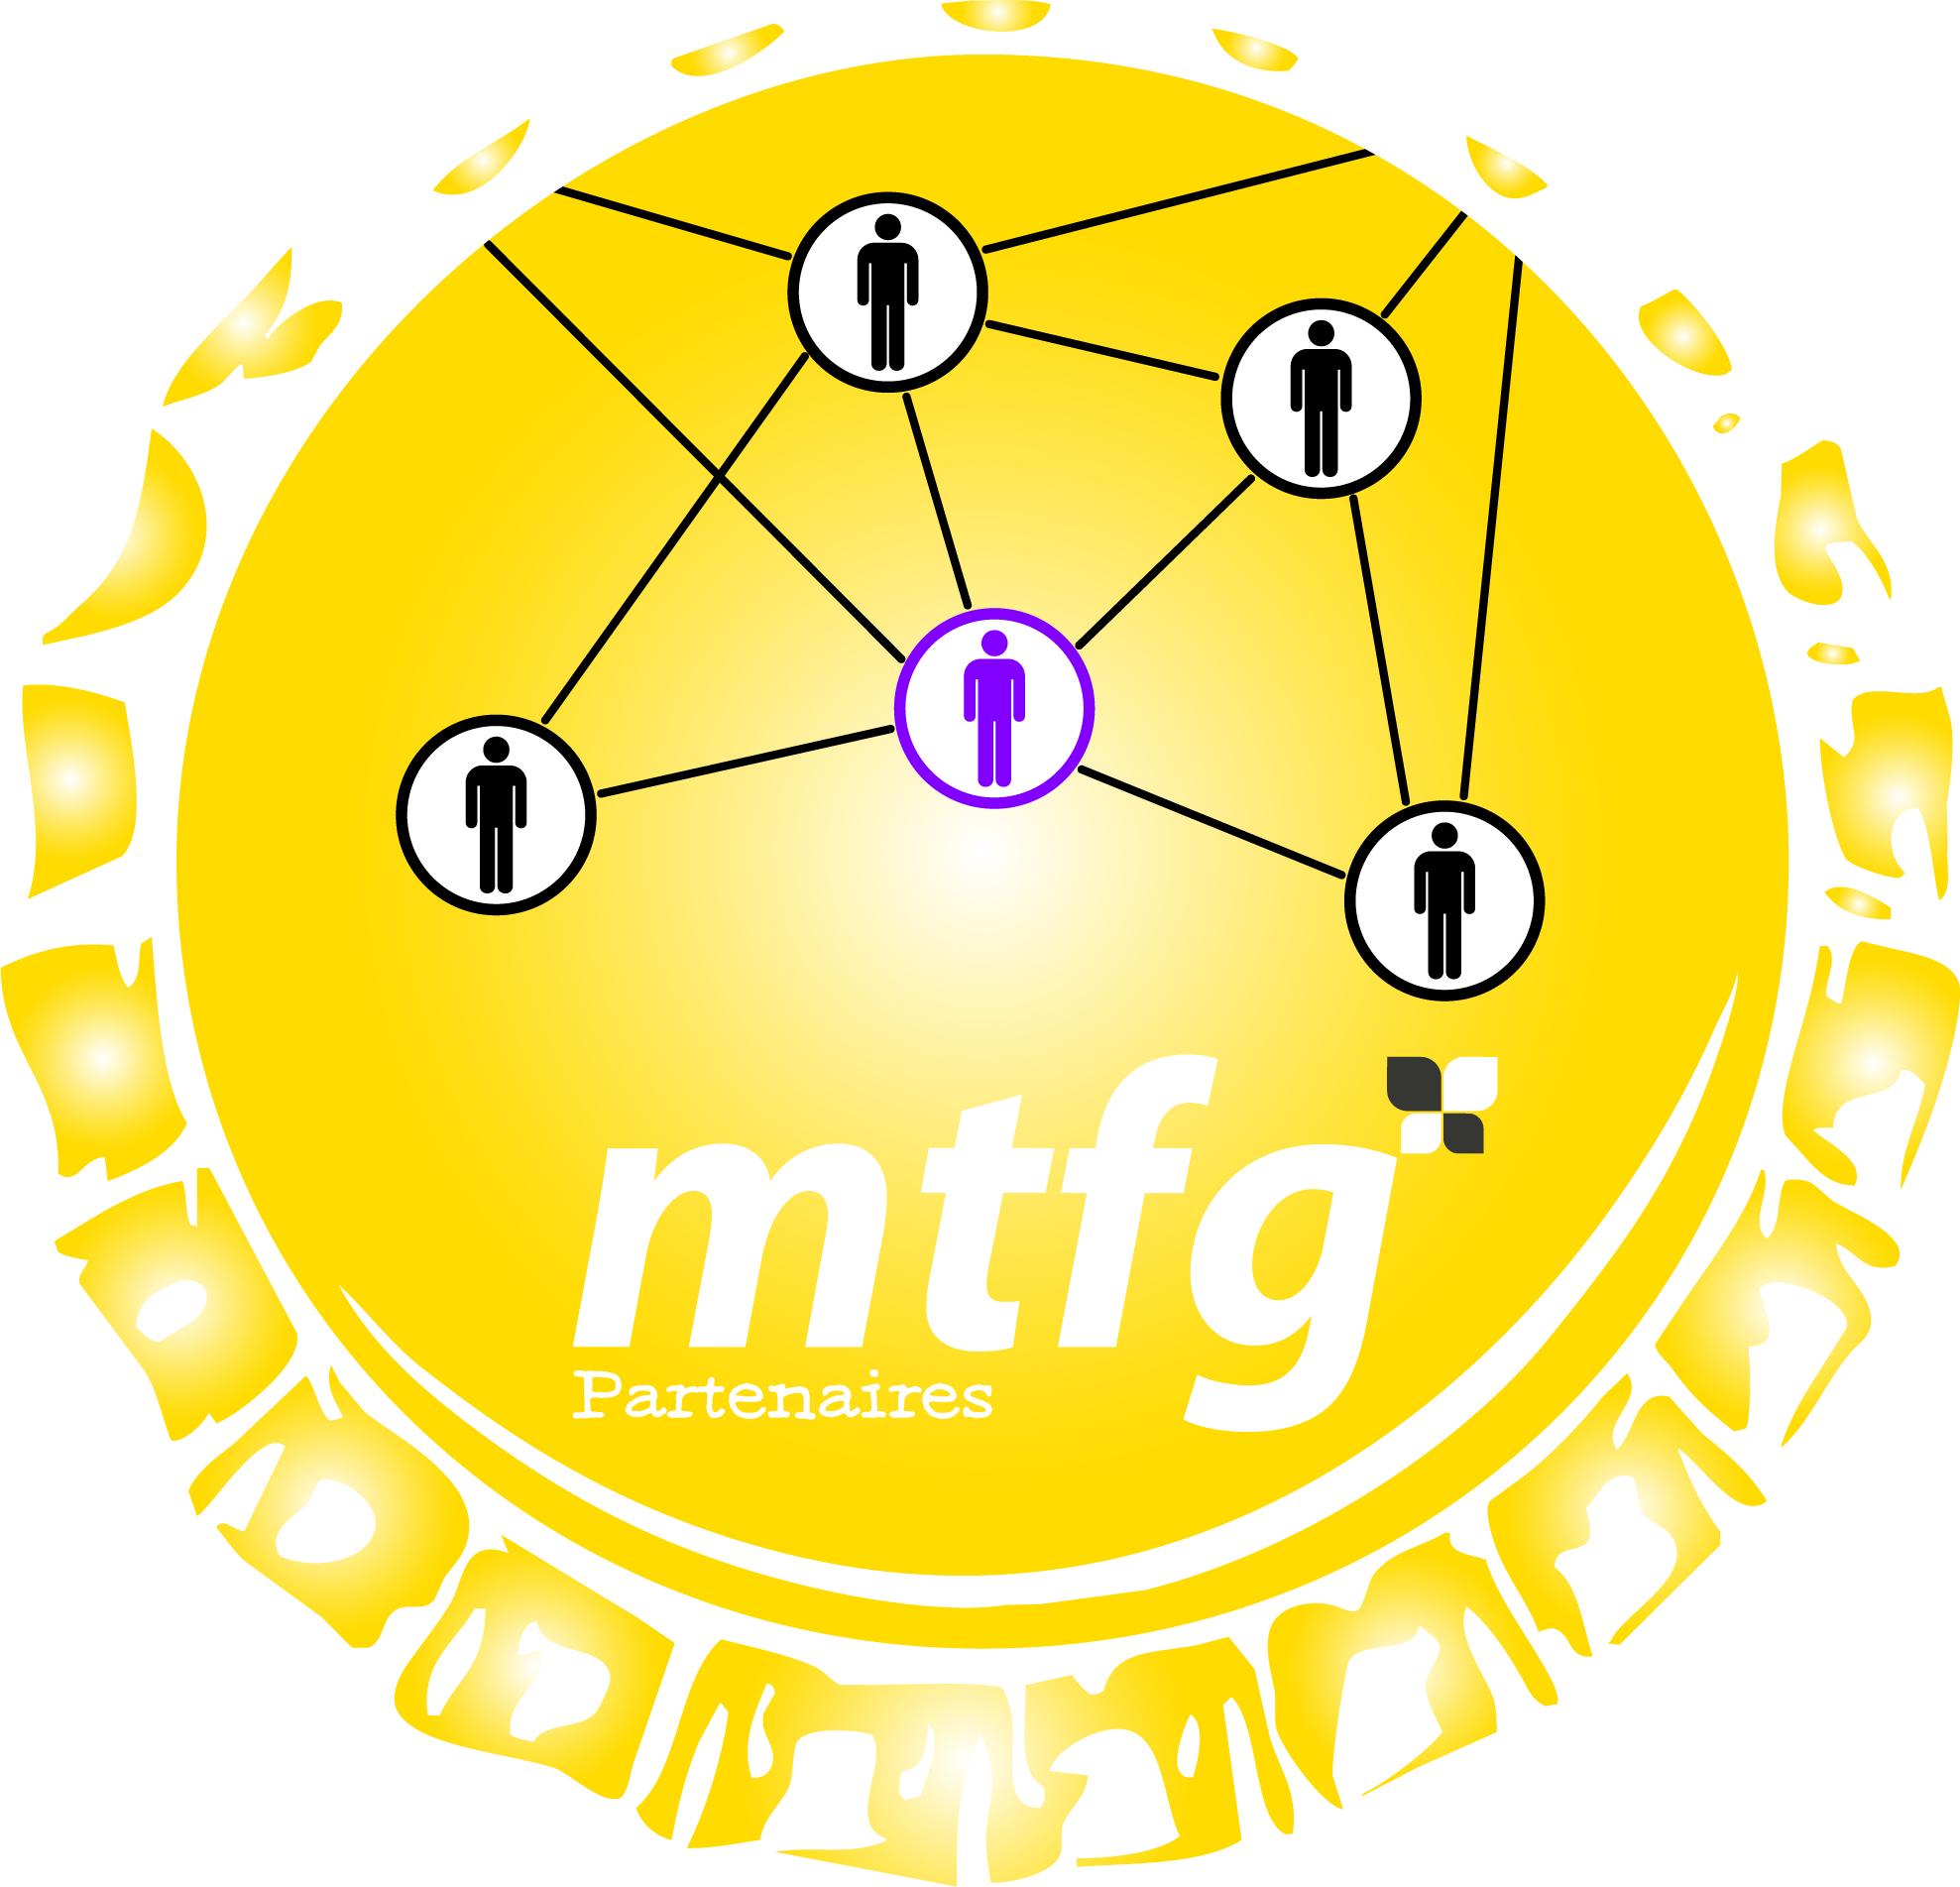 MTFG Partenaires